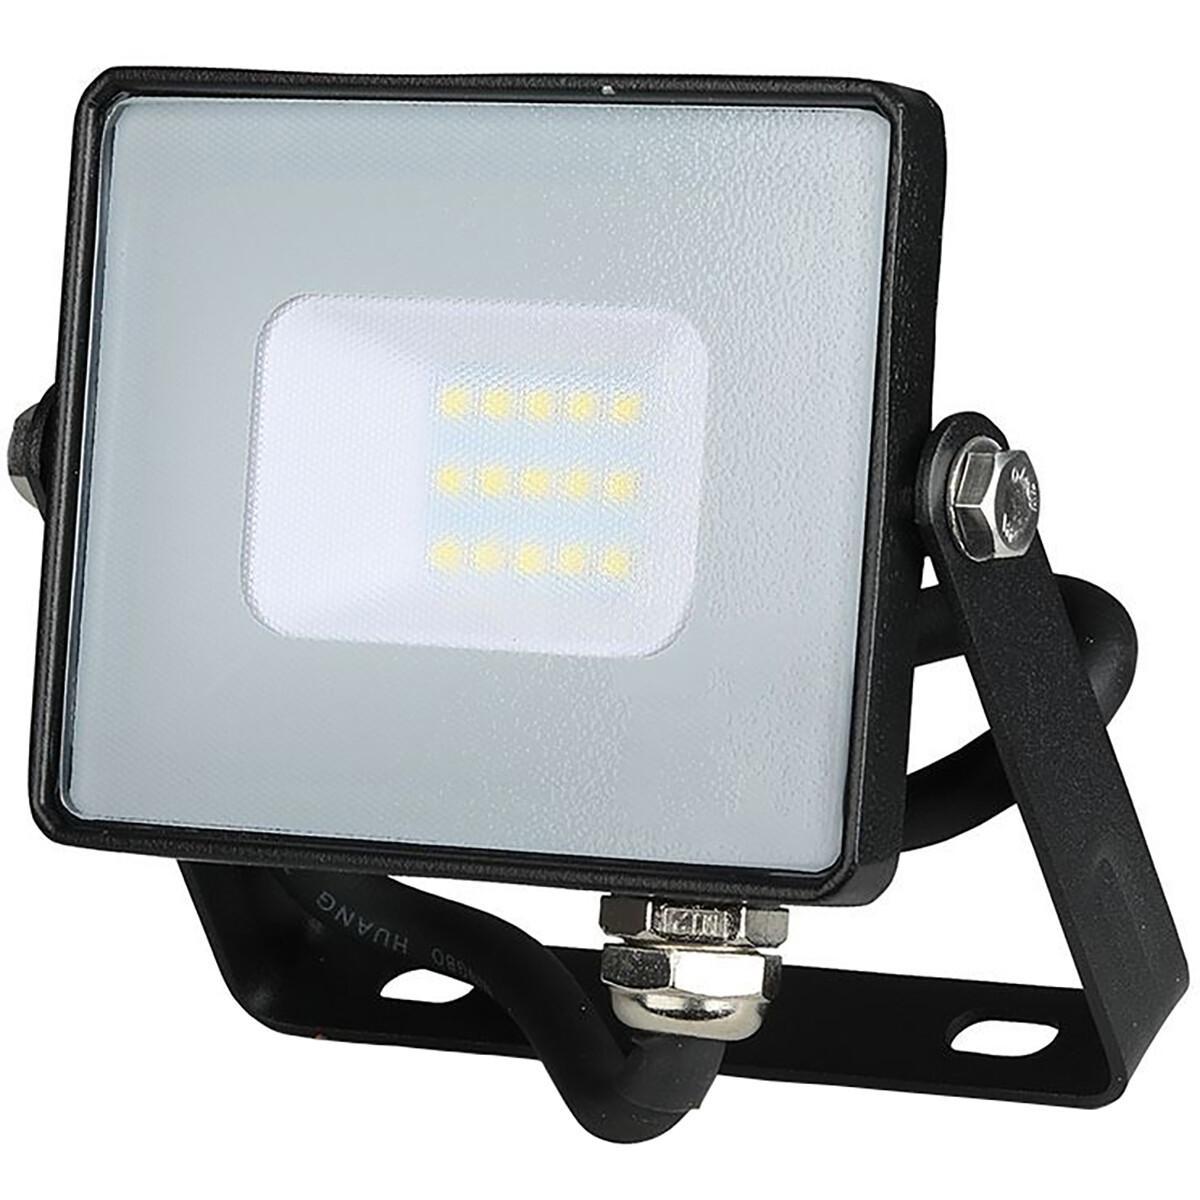 SAMSUNG - LED Bouwlamp 10 Watt - LED Schijnwerper - Viron Ponimo - Helder/Koud Wit 6400K - Kabelverb